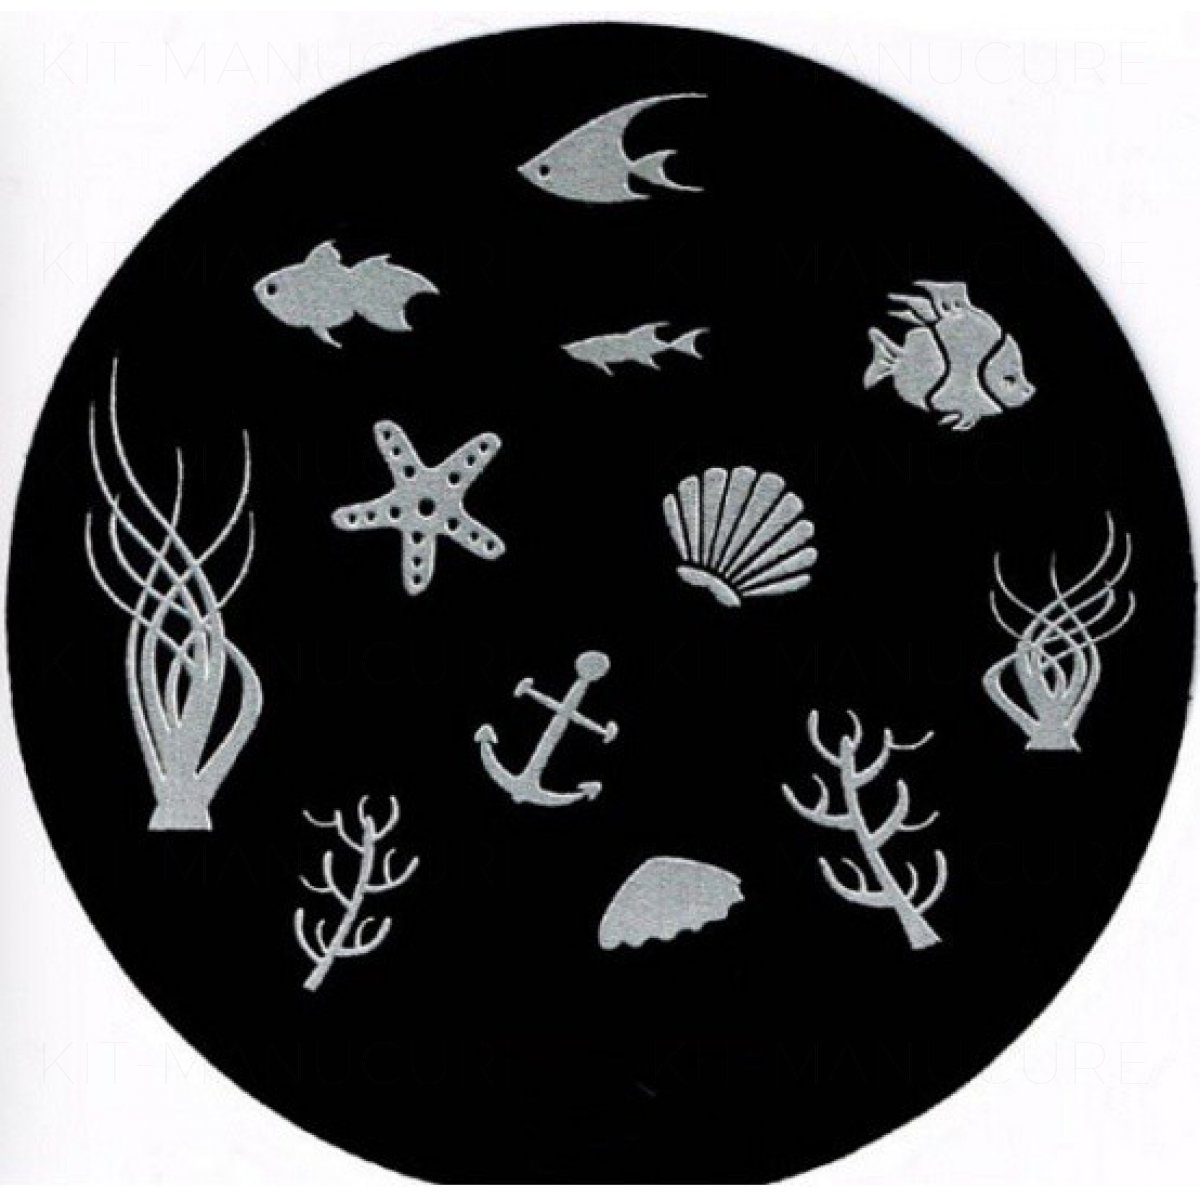 https://www.kit-manucure.com/765-thickbox_default/plaque-de-stamping-poisson-mer-et-ancre-marine.jpg